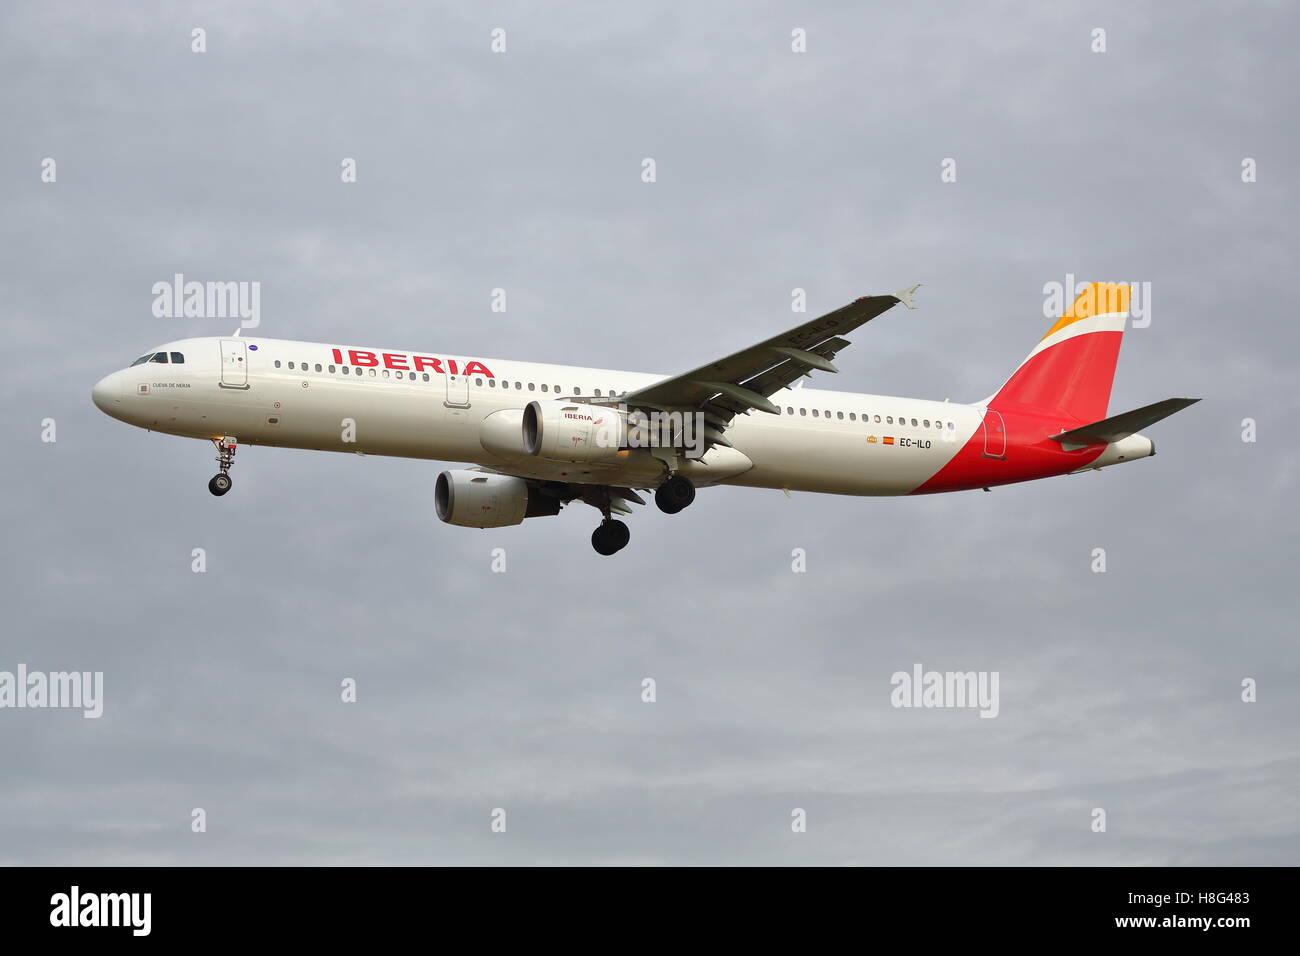 Iberia Airbus A321-212 EC-ILO landing at Heathrow Airport, London - Stock Image